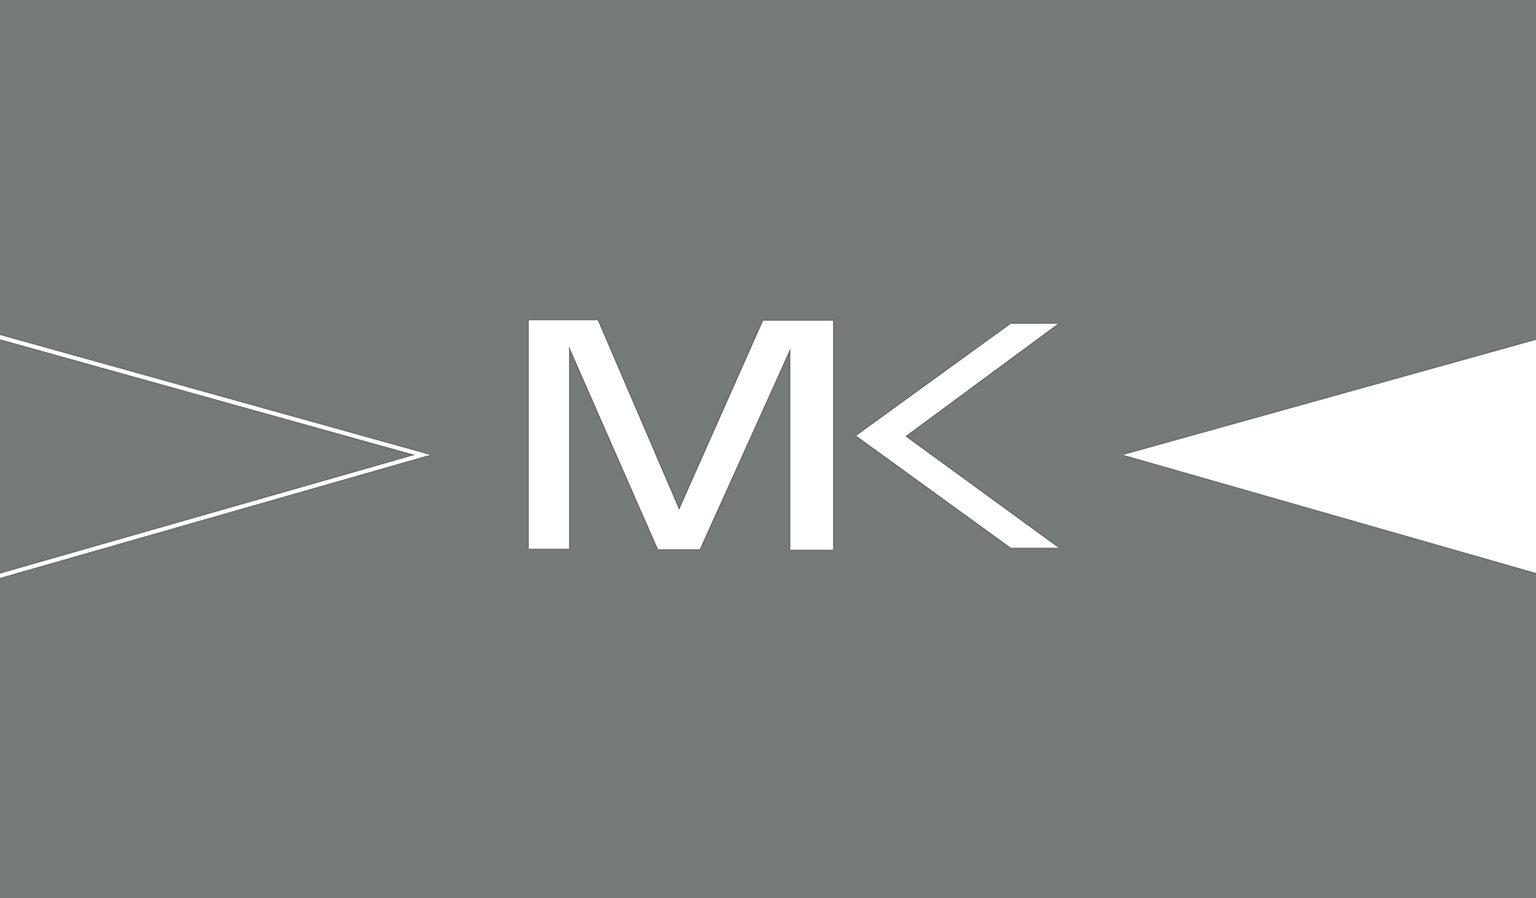 Mk big